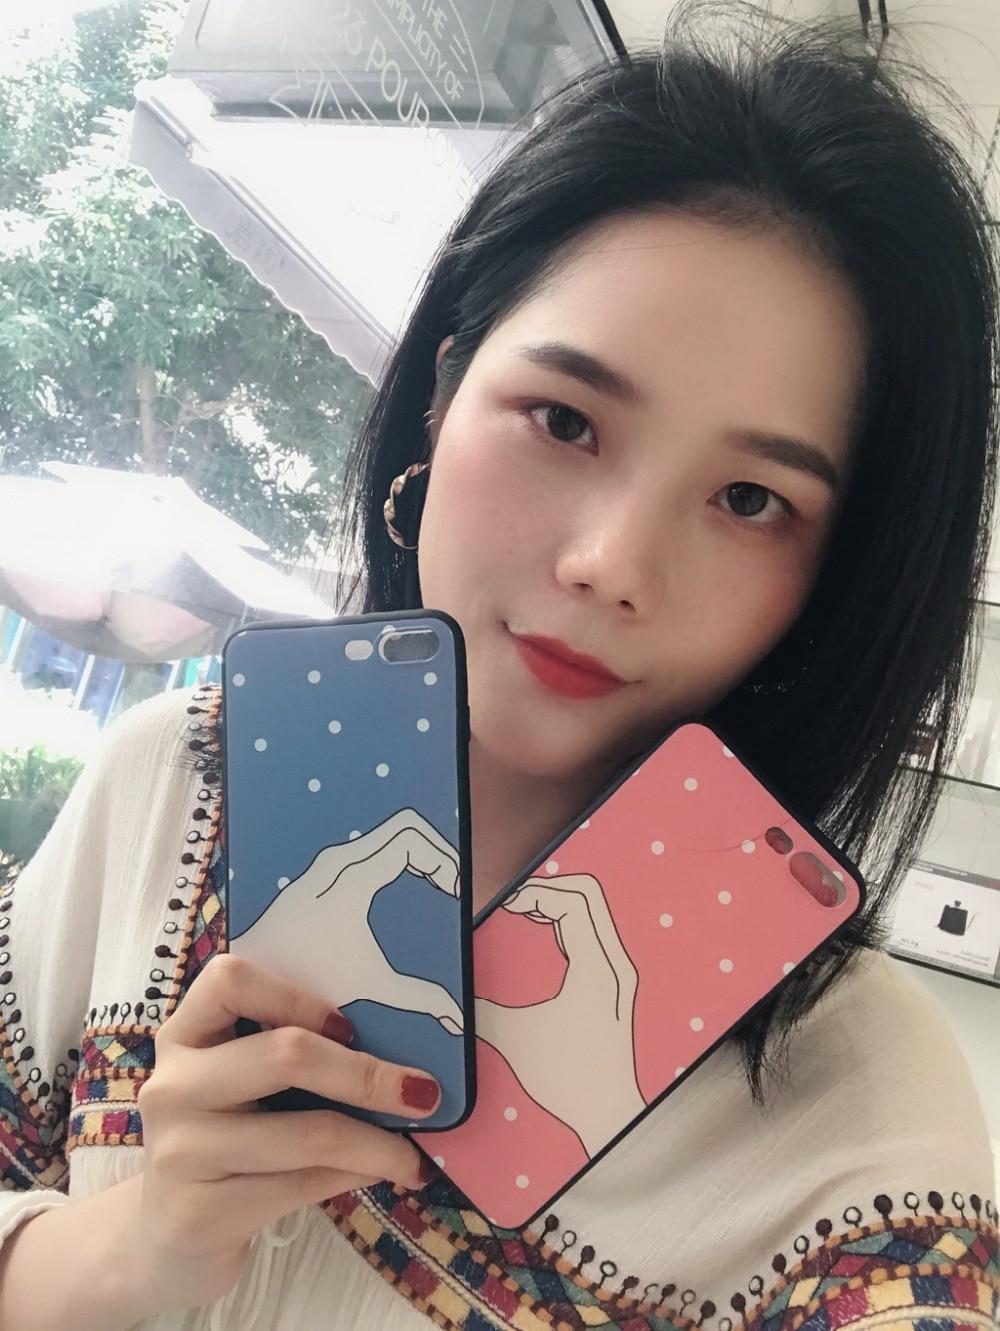 MA Couple Series Phone Case For Huawei P8 lite 2017 P9 P10 P20 Lite Plus Nova Honor6C 6A 6X Honor8 Honor9 Mate 10lite soft cov